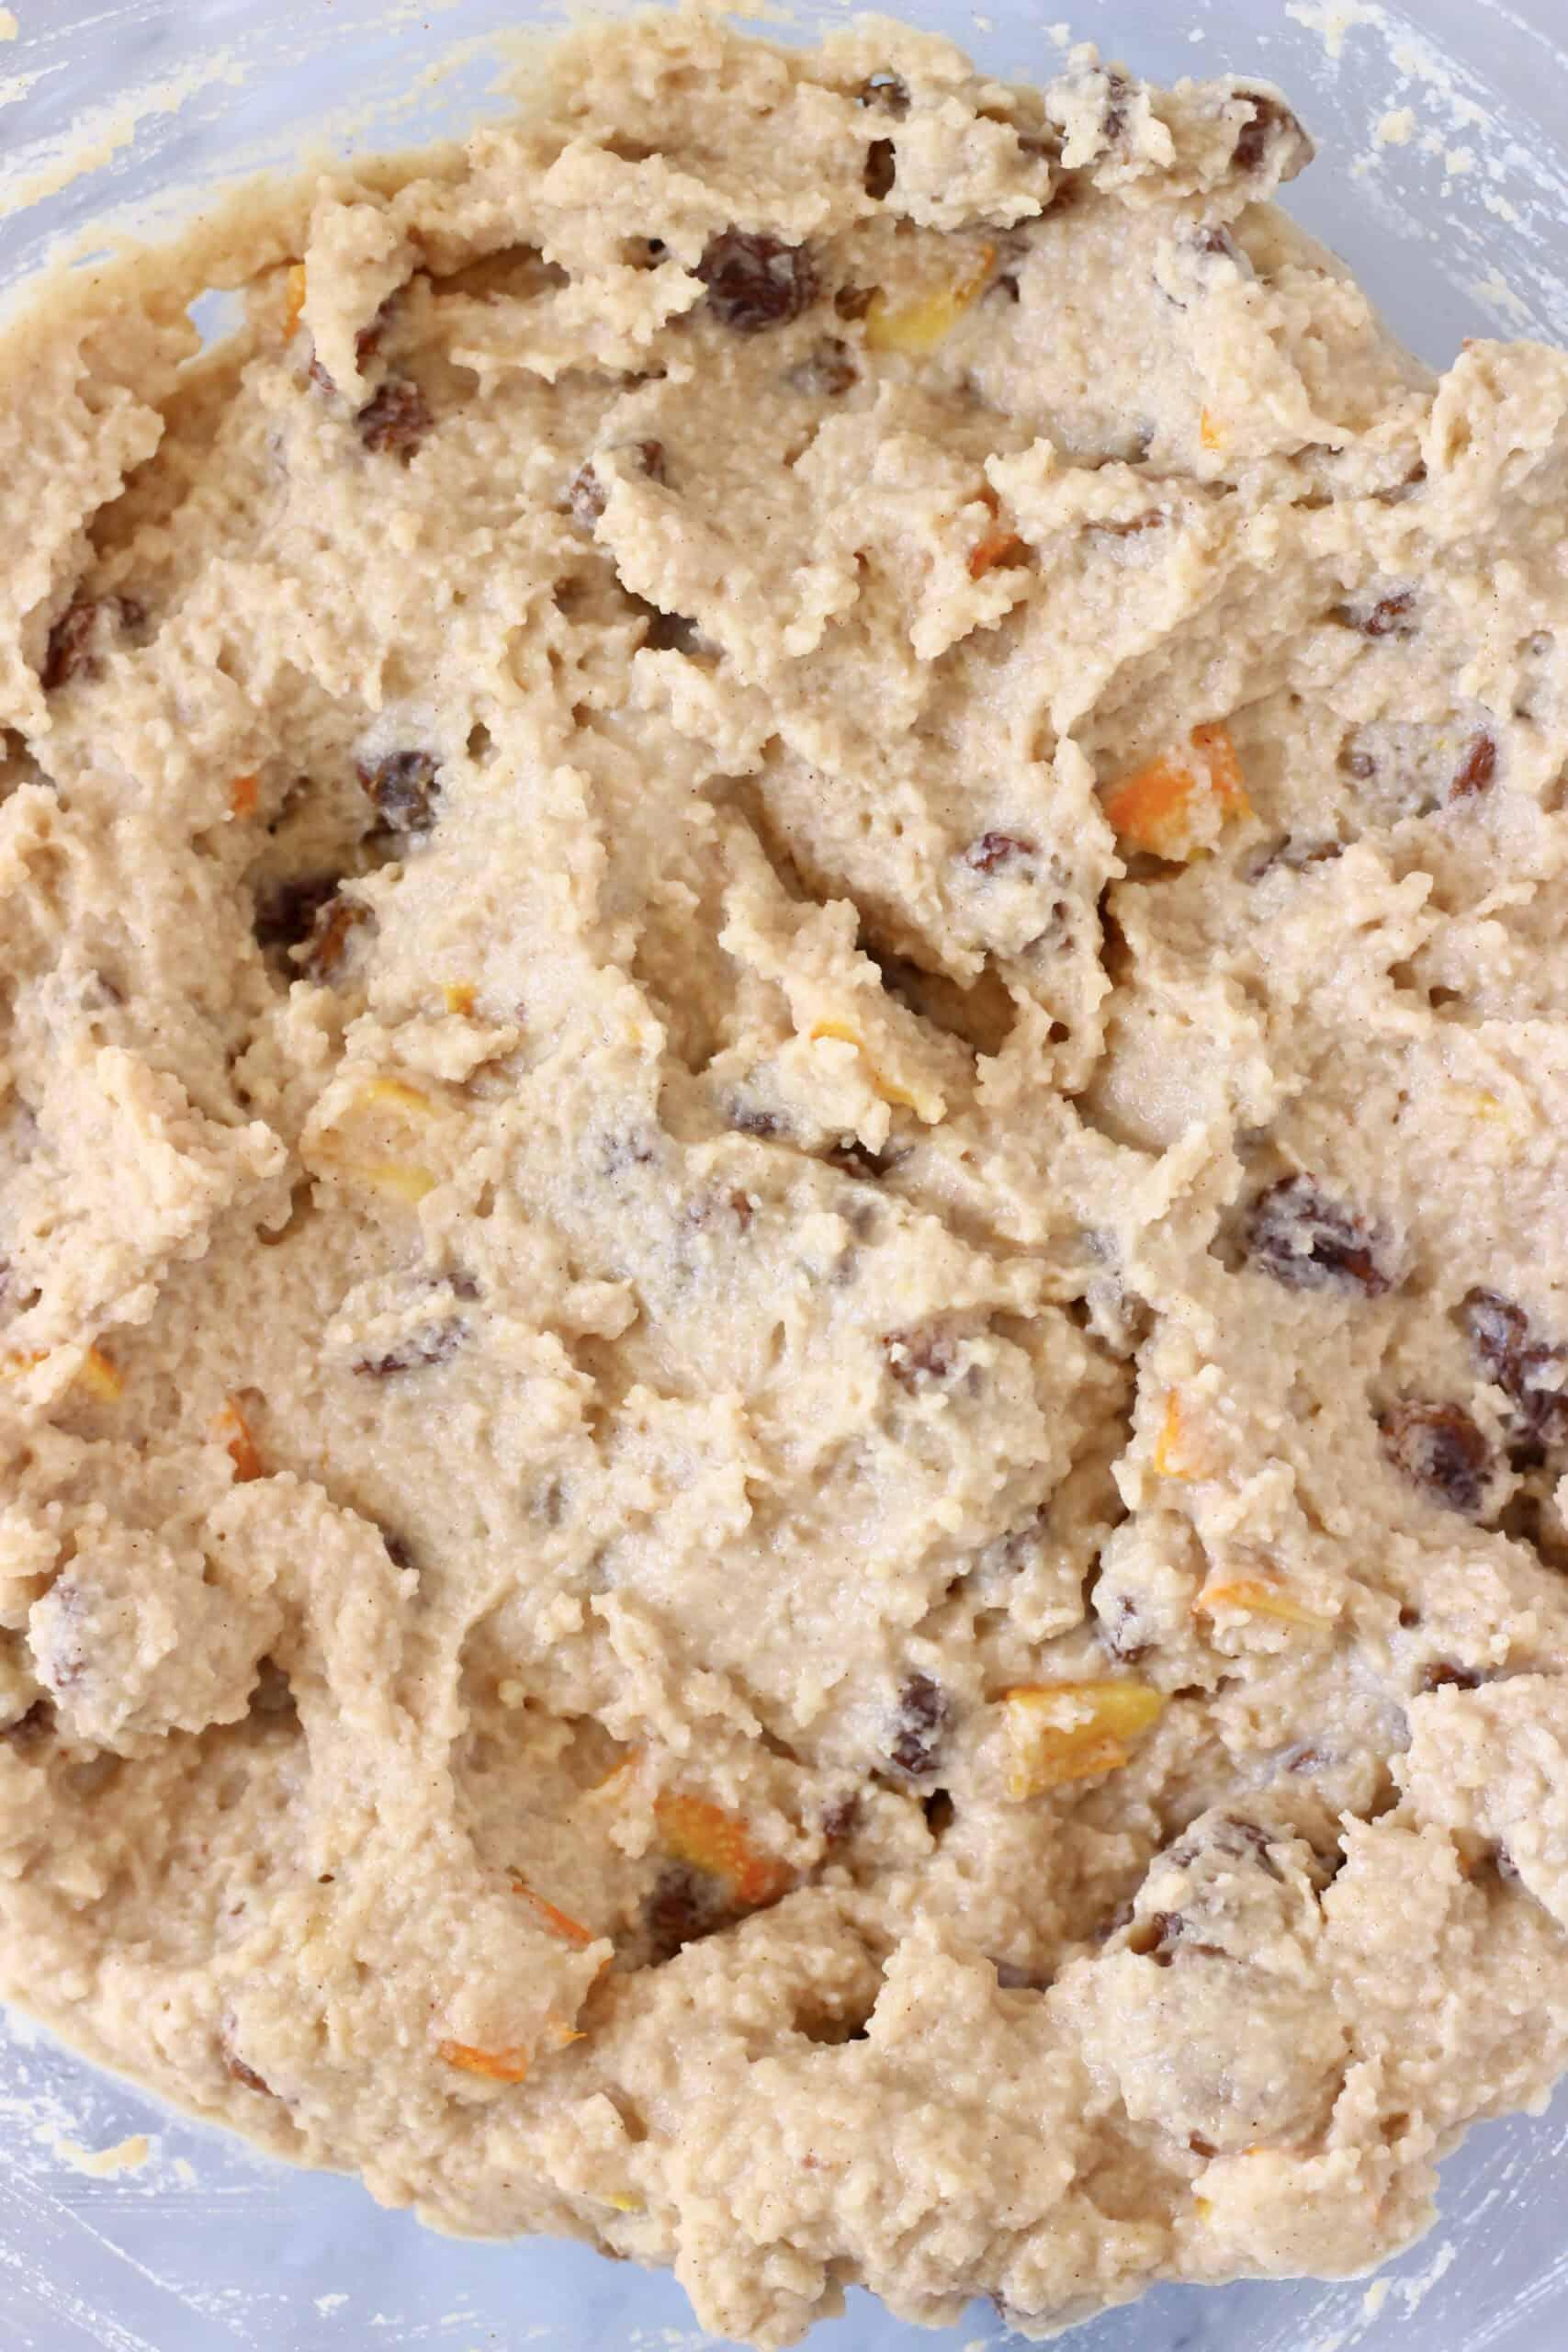 Raw gluten-free vegan hot cross bun loaf batter in a bowl